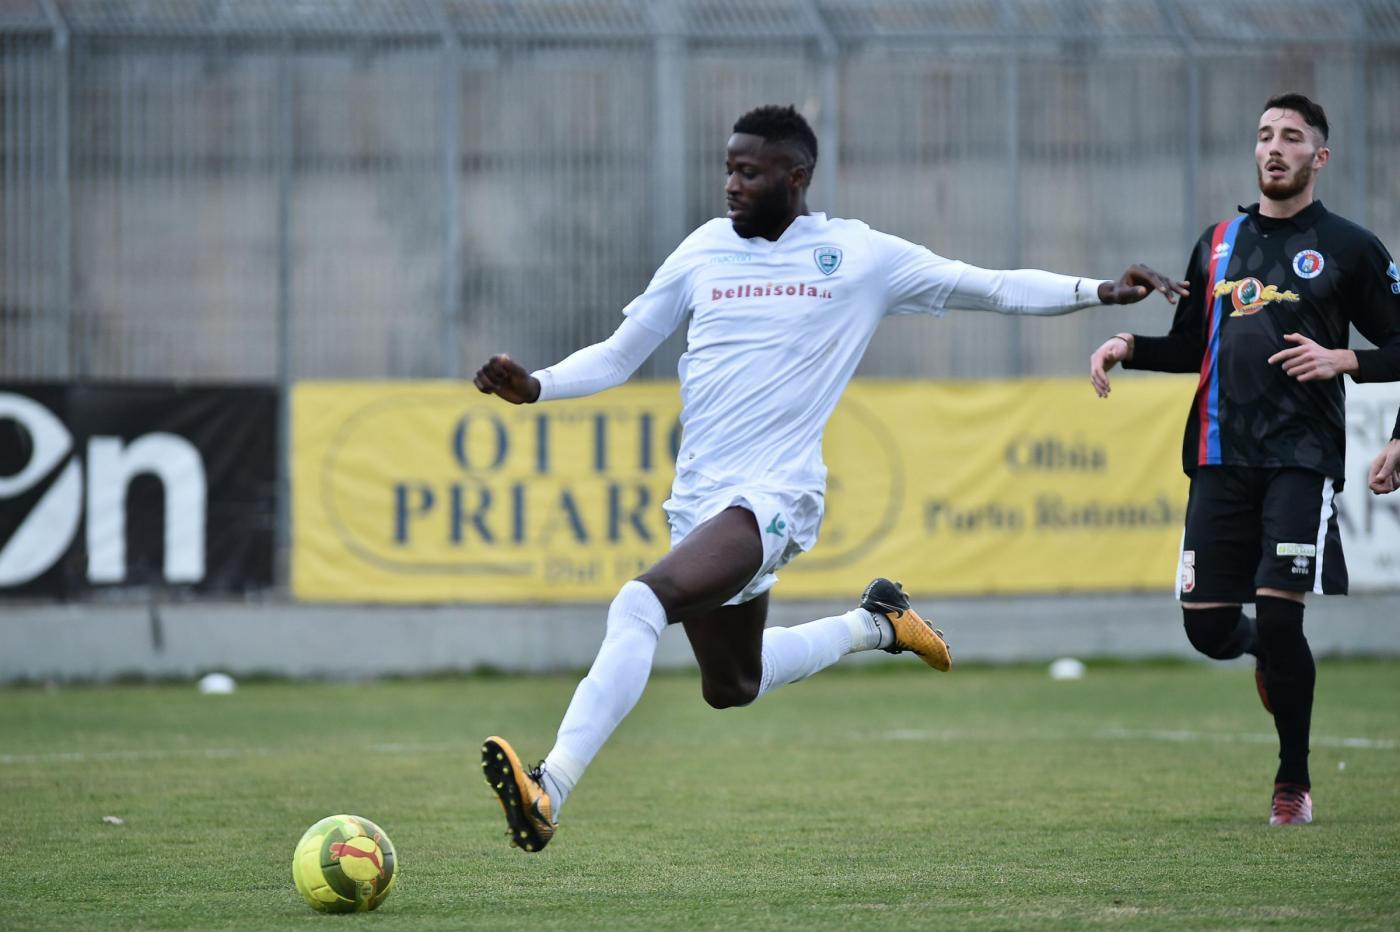 Serie C, Olbia-Prato 14 aprile: salvezza difficile per i toscani